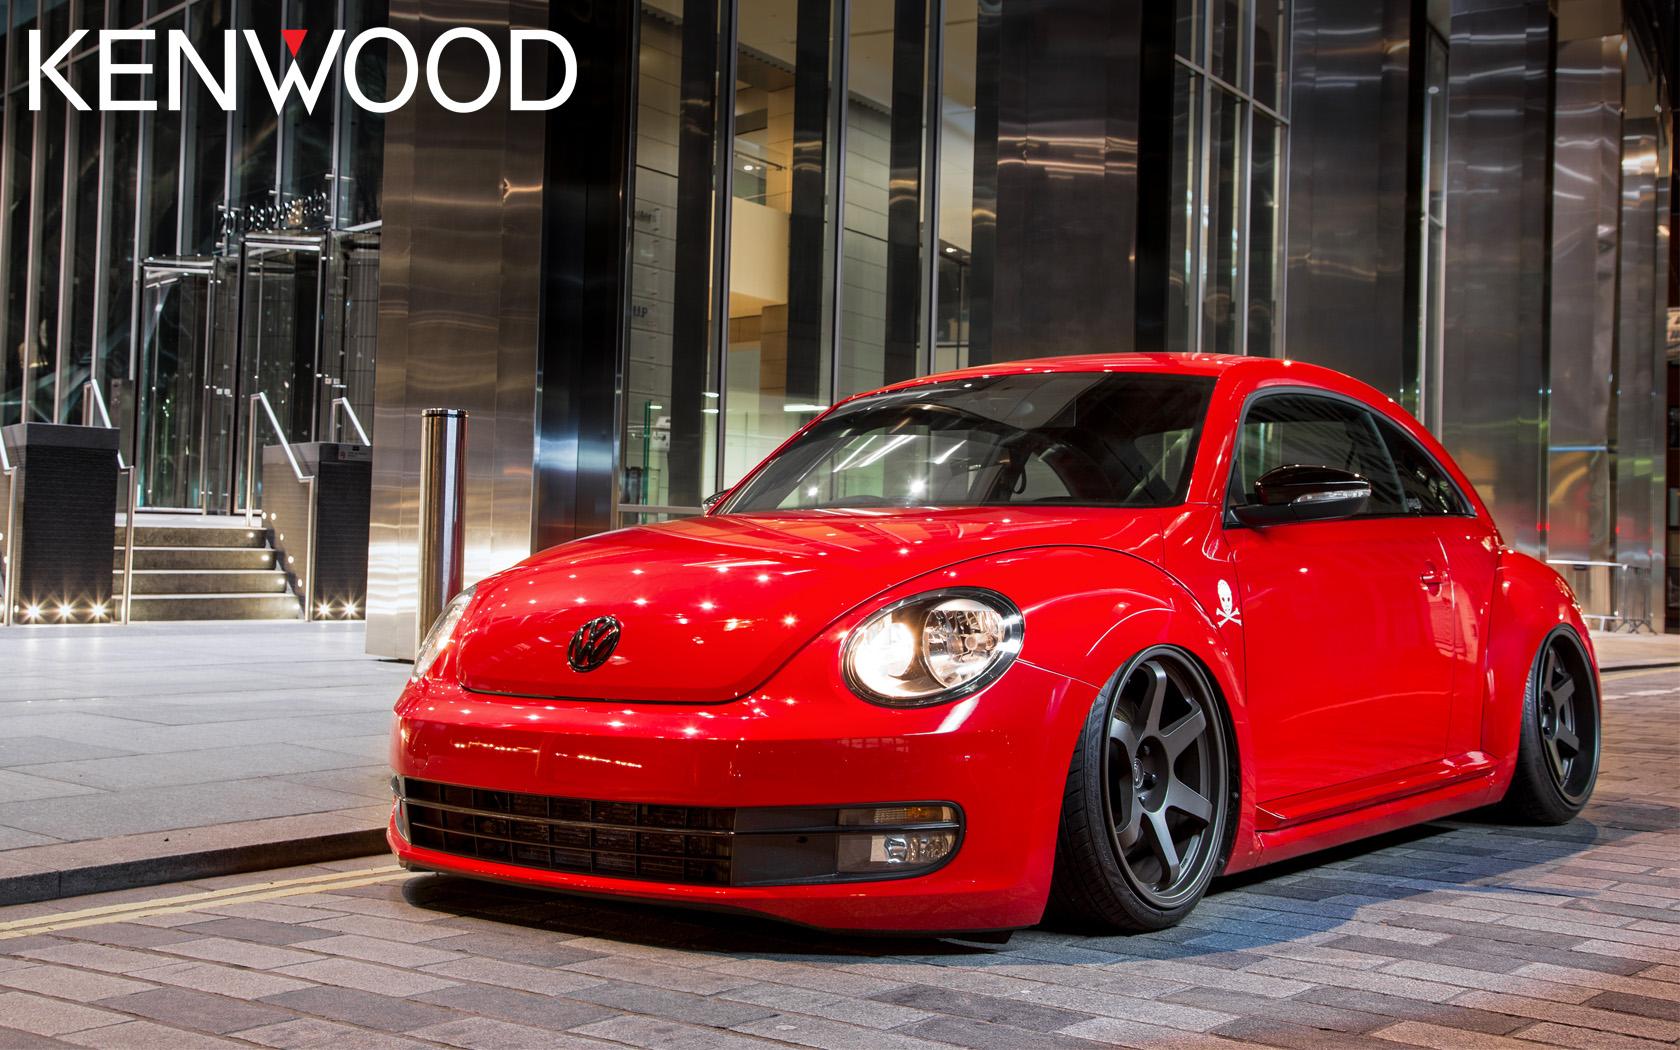 beetle air ride kenwood car audio entertainment